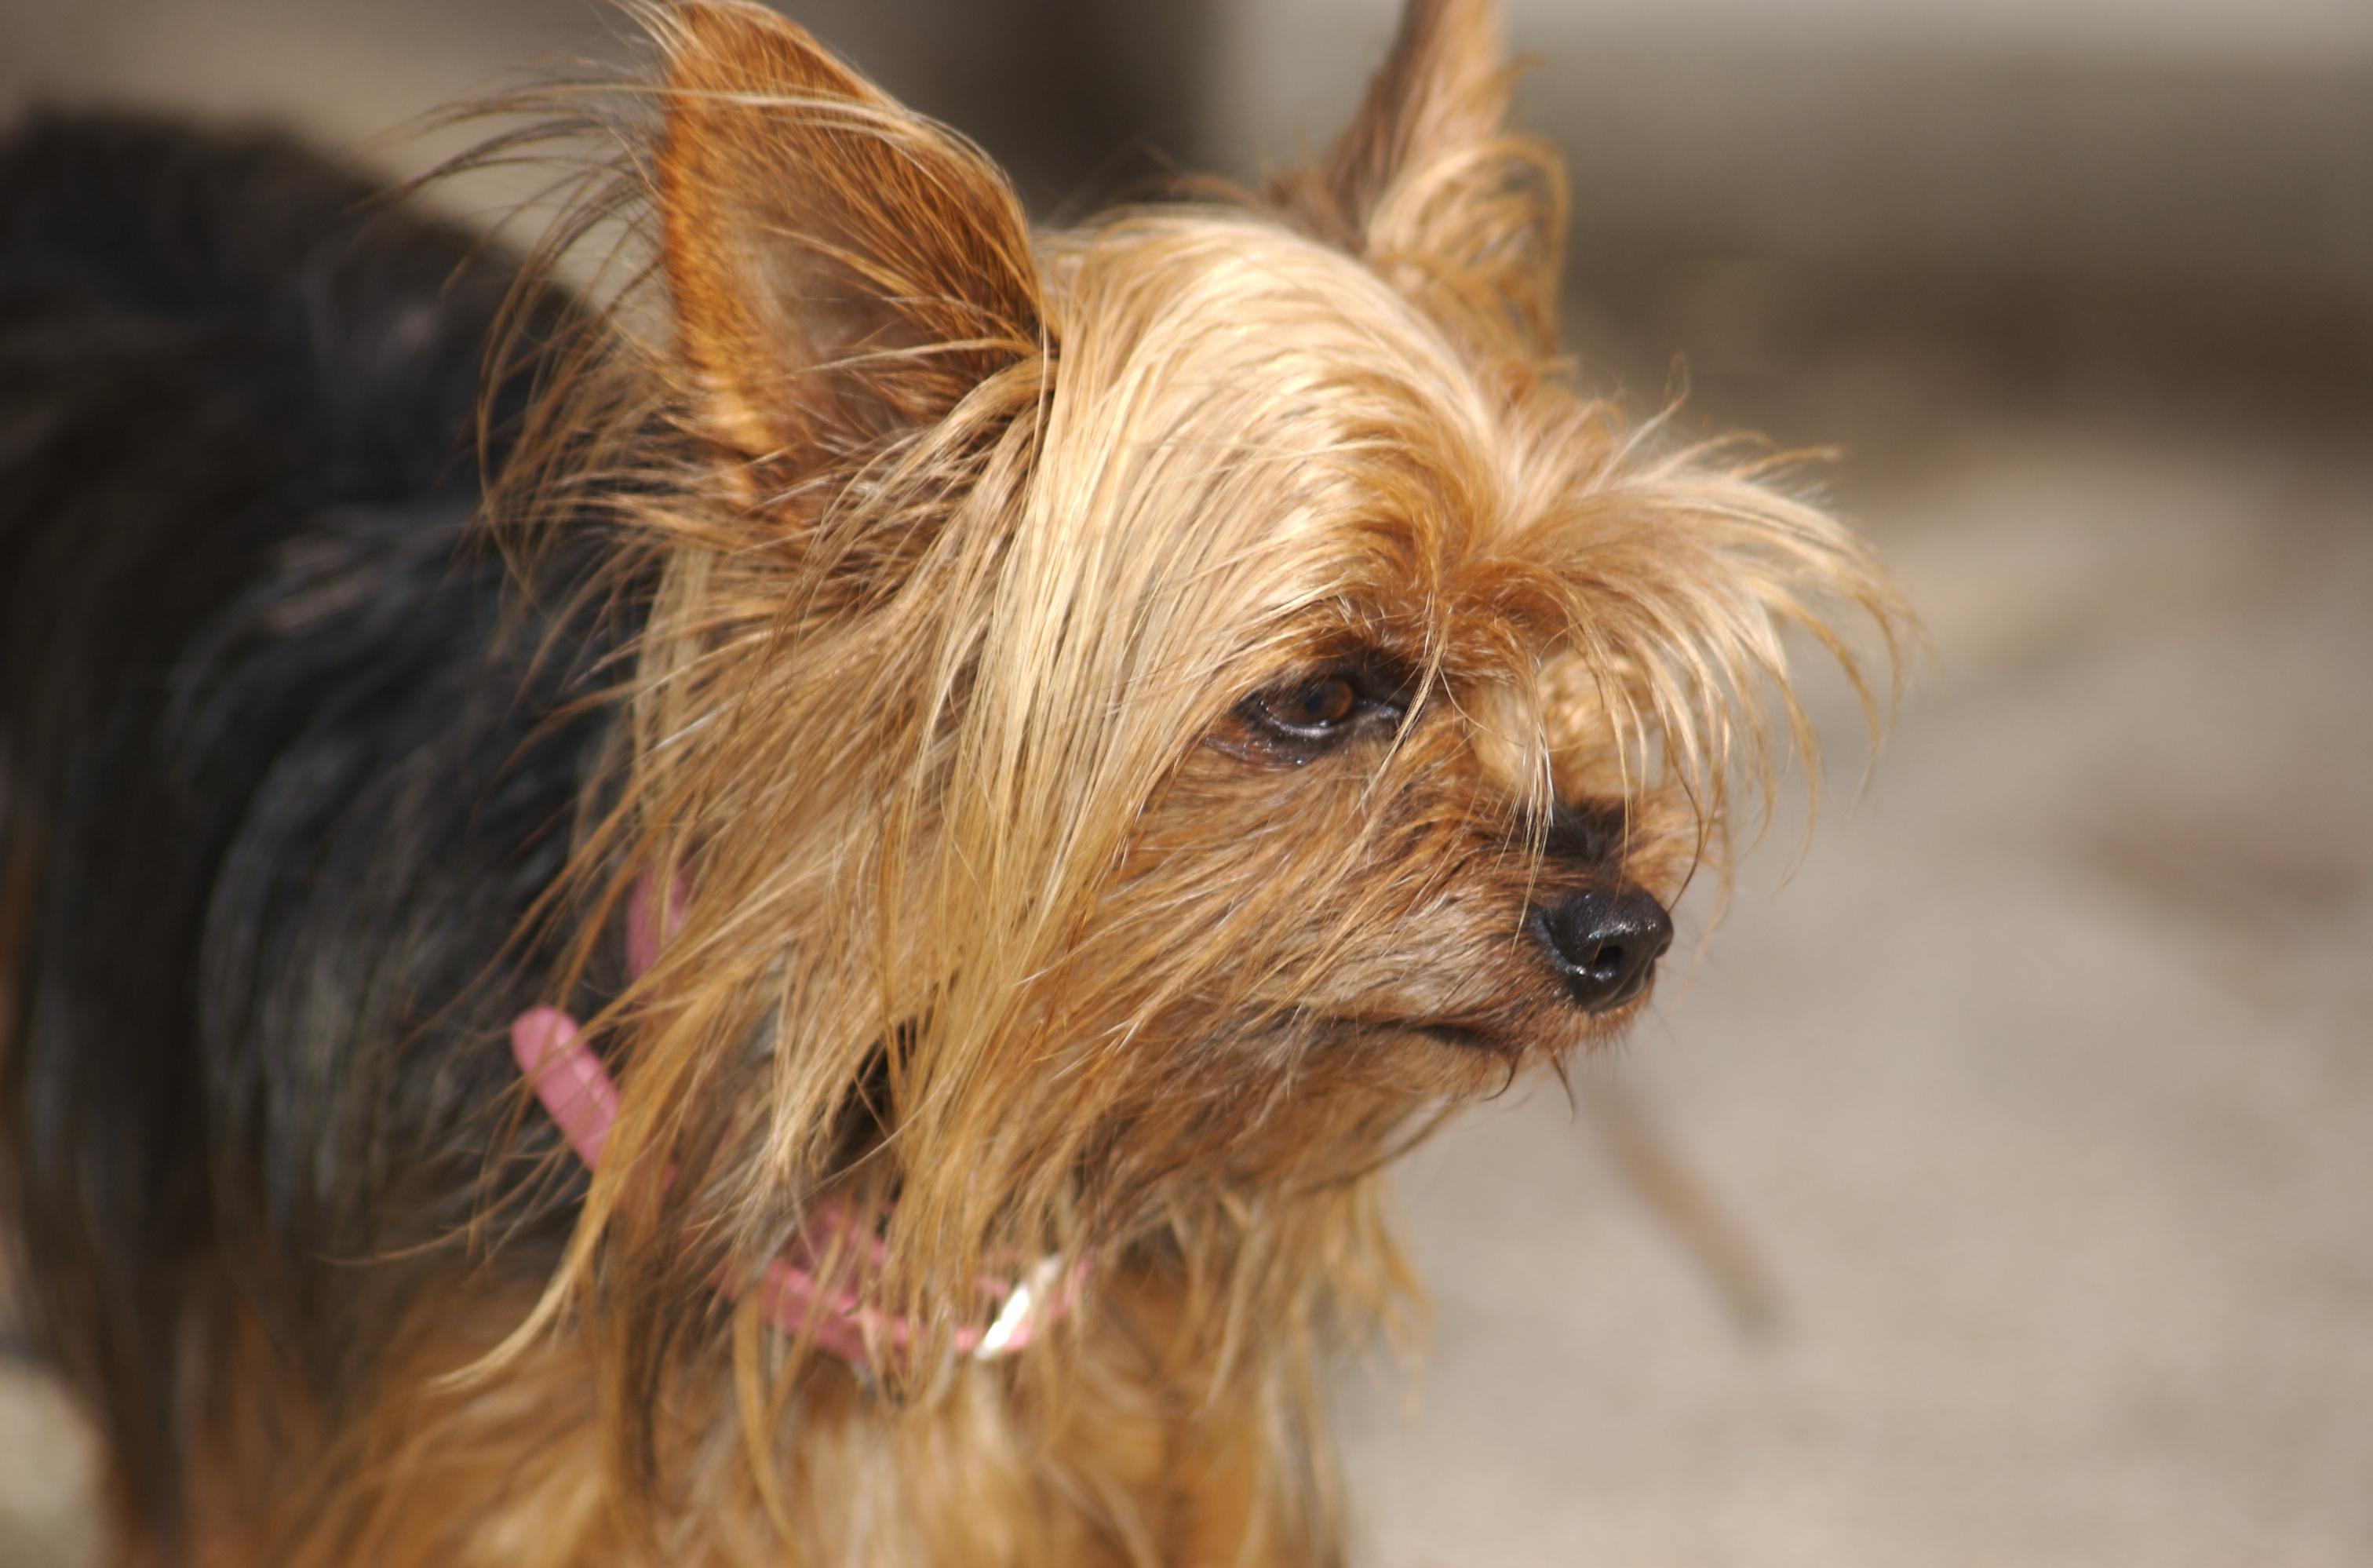 Yorkshire Terrier Kidney Failure File:Teacupyorkie2.jpg...